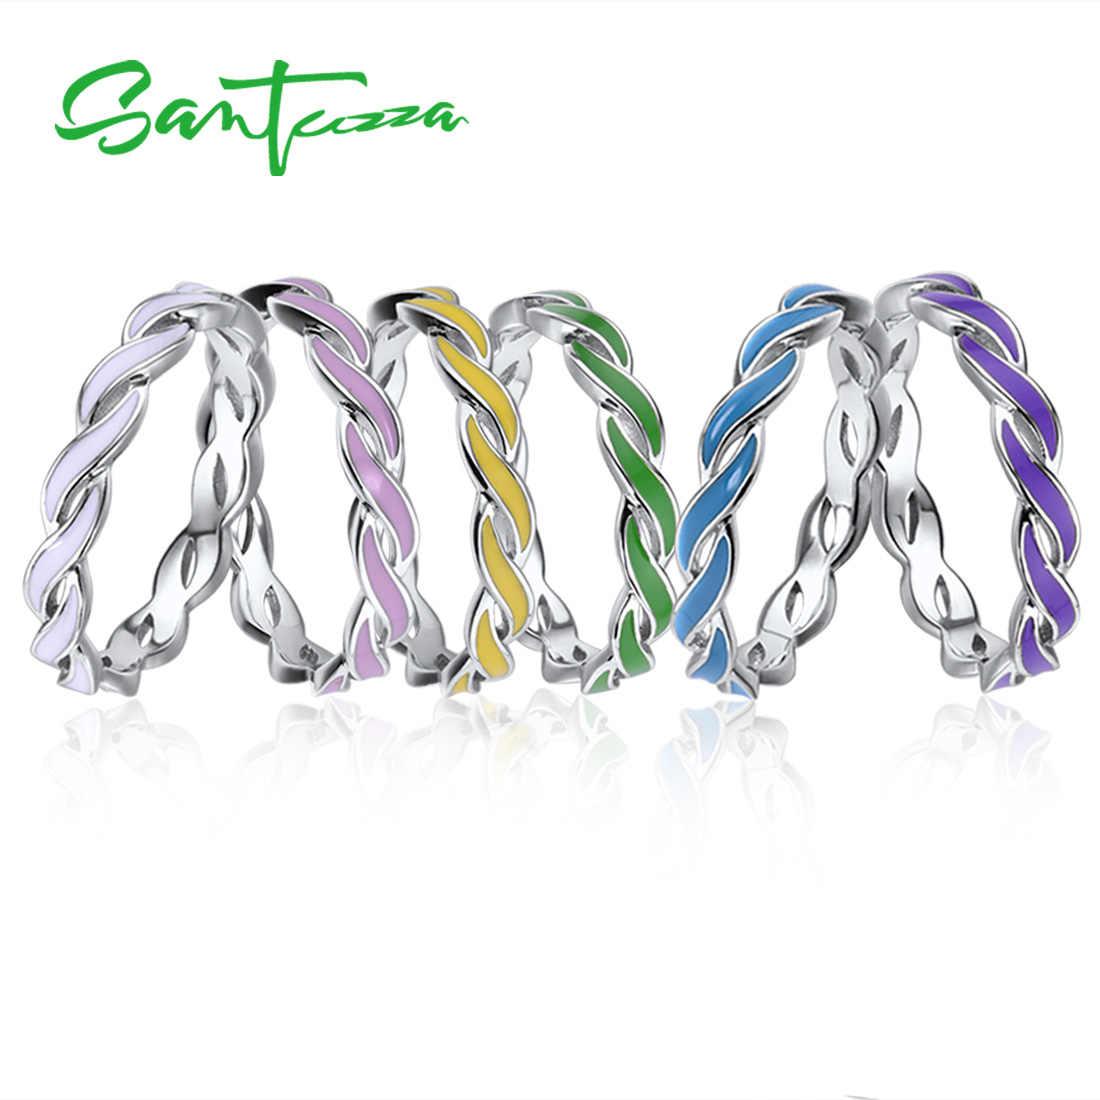 SANTUZZA 925 เงินสเตอร์ลิงแหวนเงินผู้หญิงที่มีสีสัน Twisted Stackable แหวน Eternity แหวนแฟชั่นเครื่องประดับทำด้วยมือเคลือบ